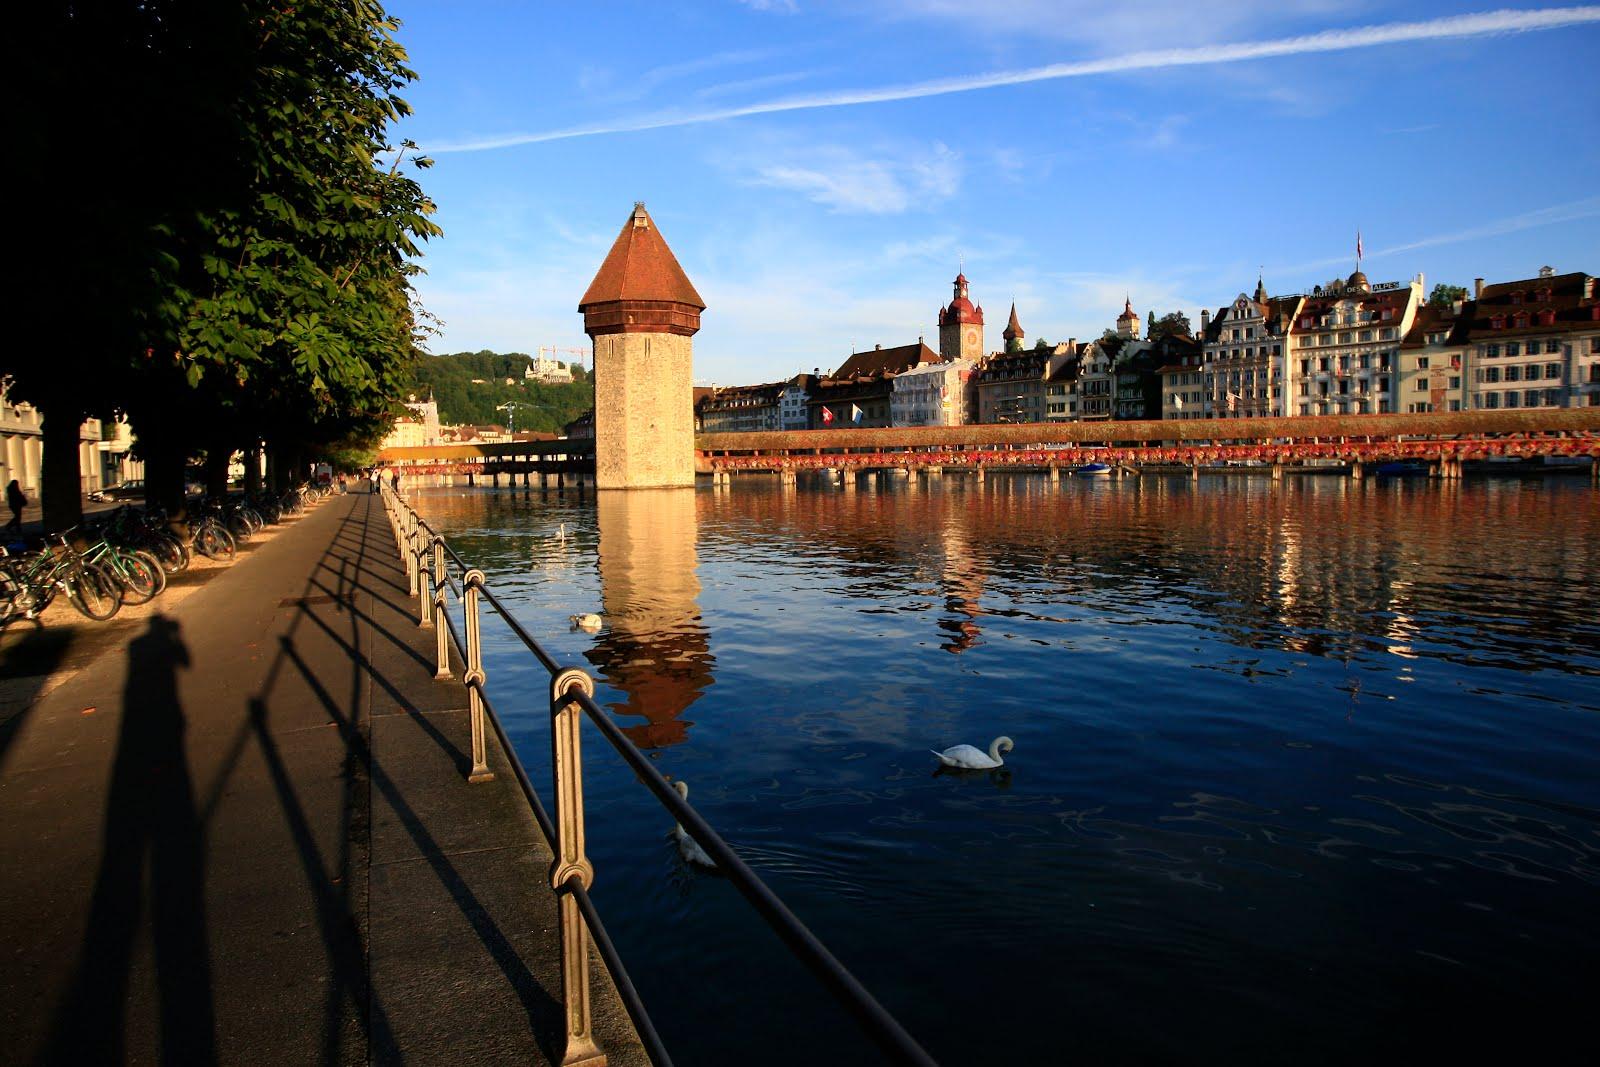 Luzern a virágos fahíd.JPG